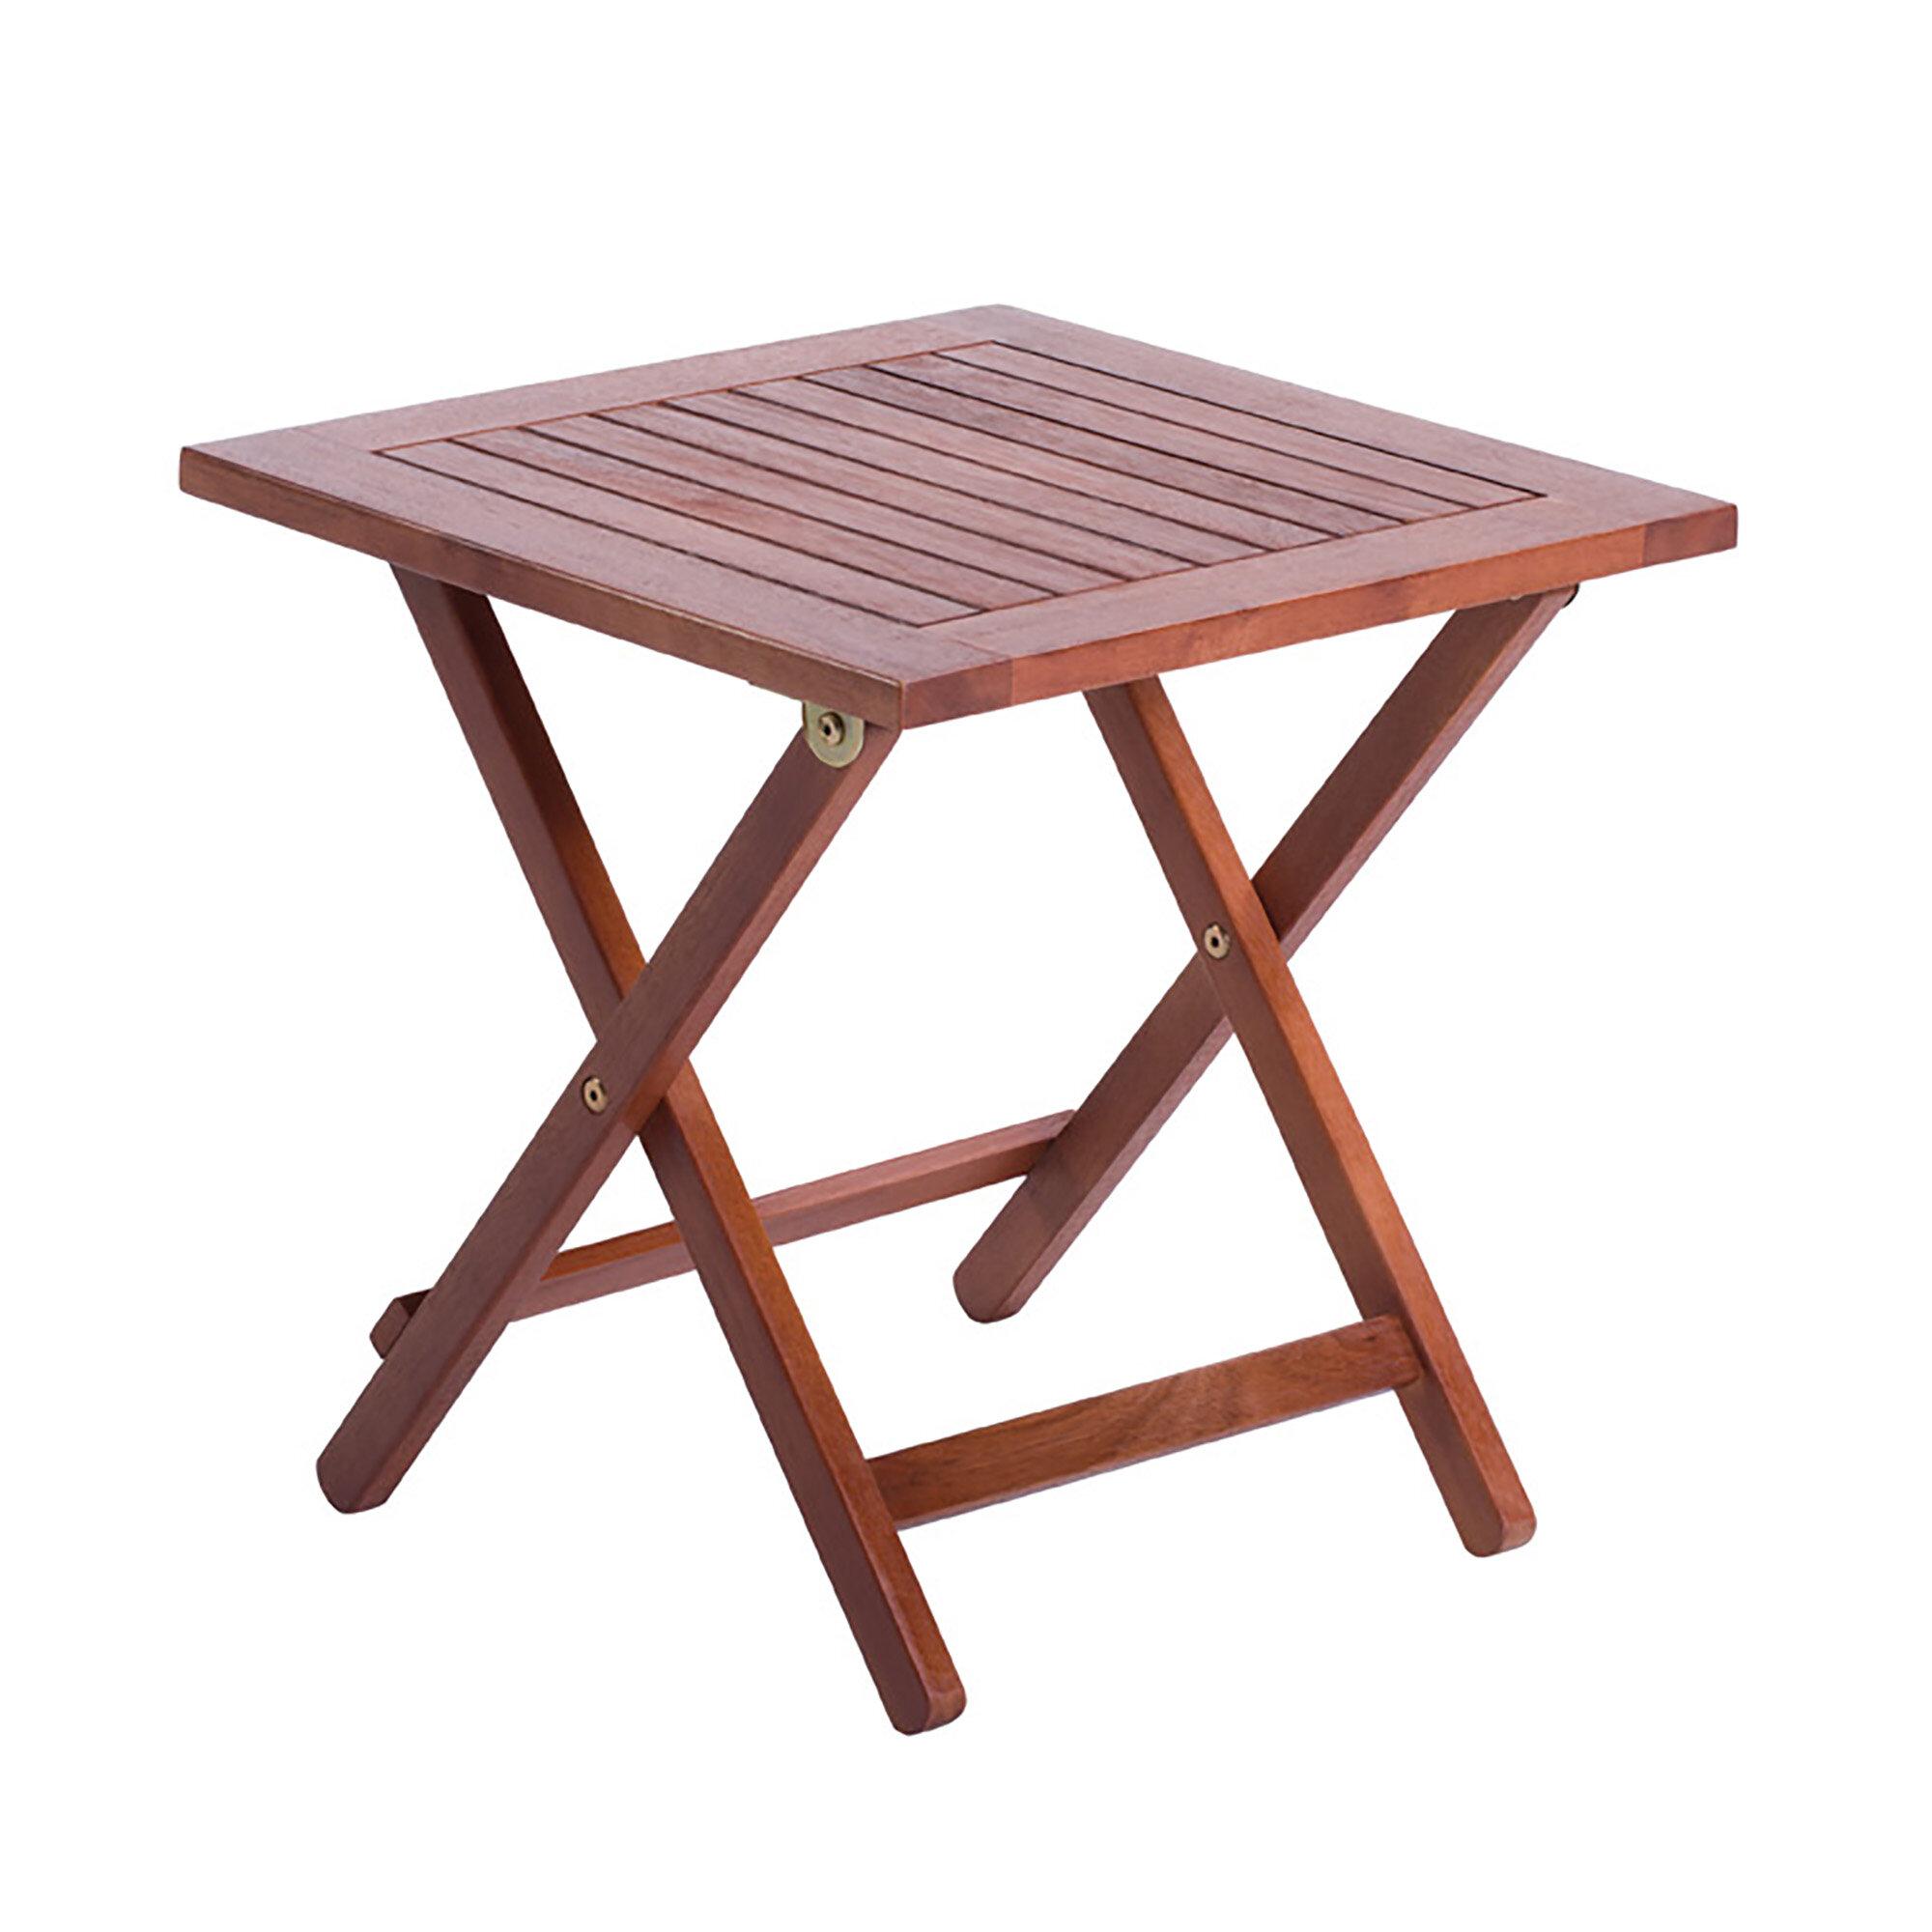 Merveilleux Arboria Ethier Folding Side Table | Wayfair